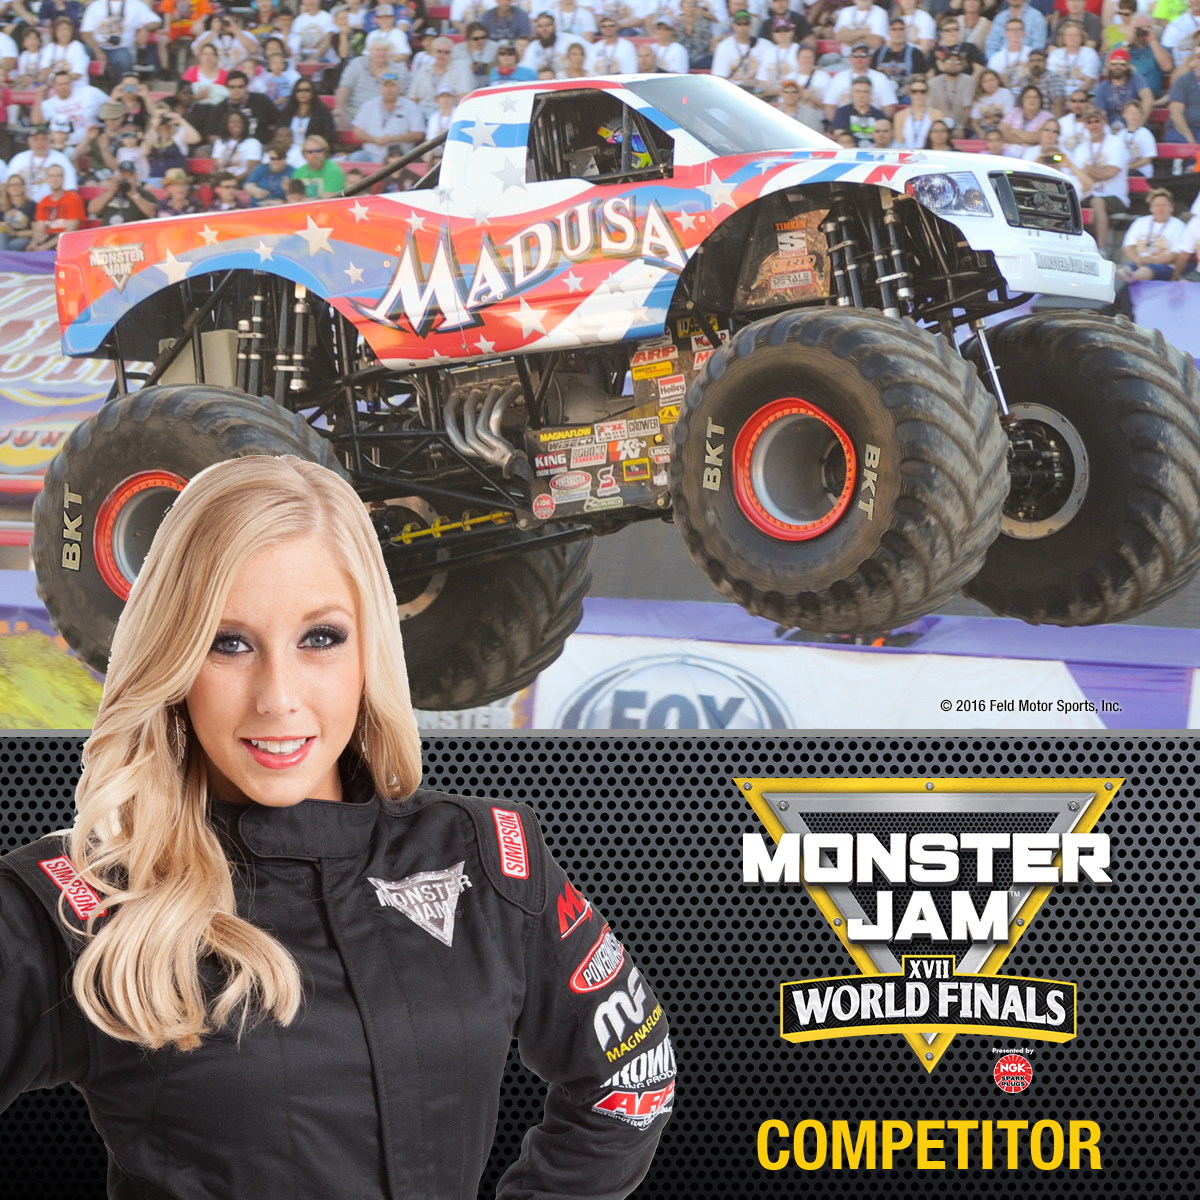 Ausmalbild Madusa Monster Truck: Monster Jam World Finals® XVII Competitors Announced